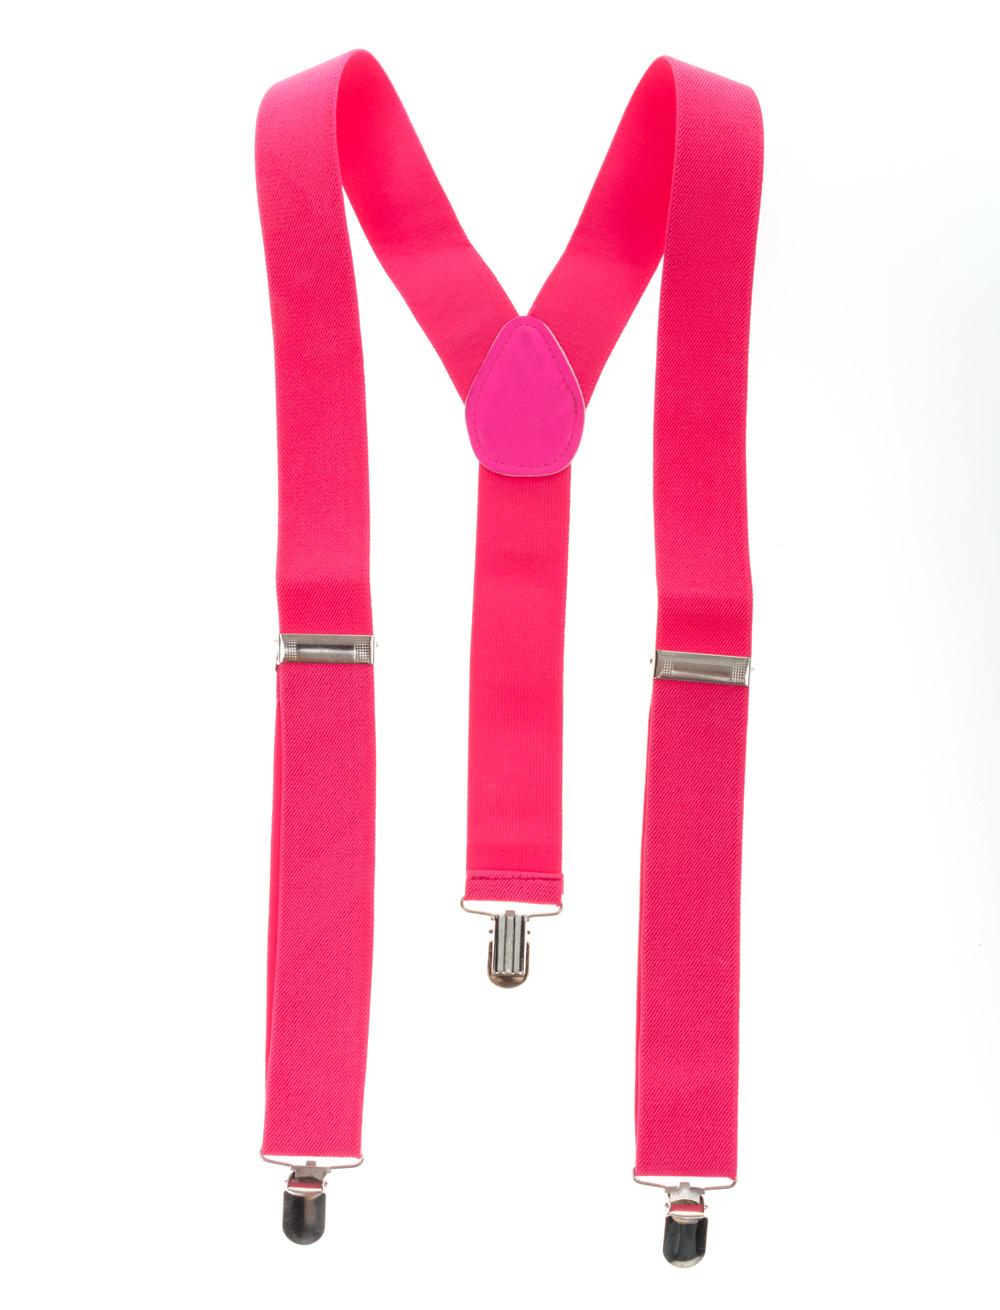 Kostuemzubehor Hosentraeger uni pink